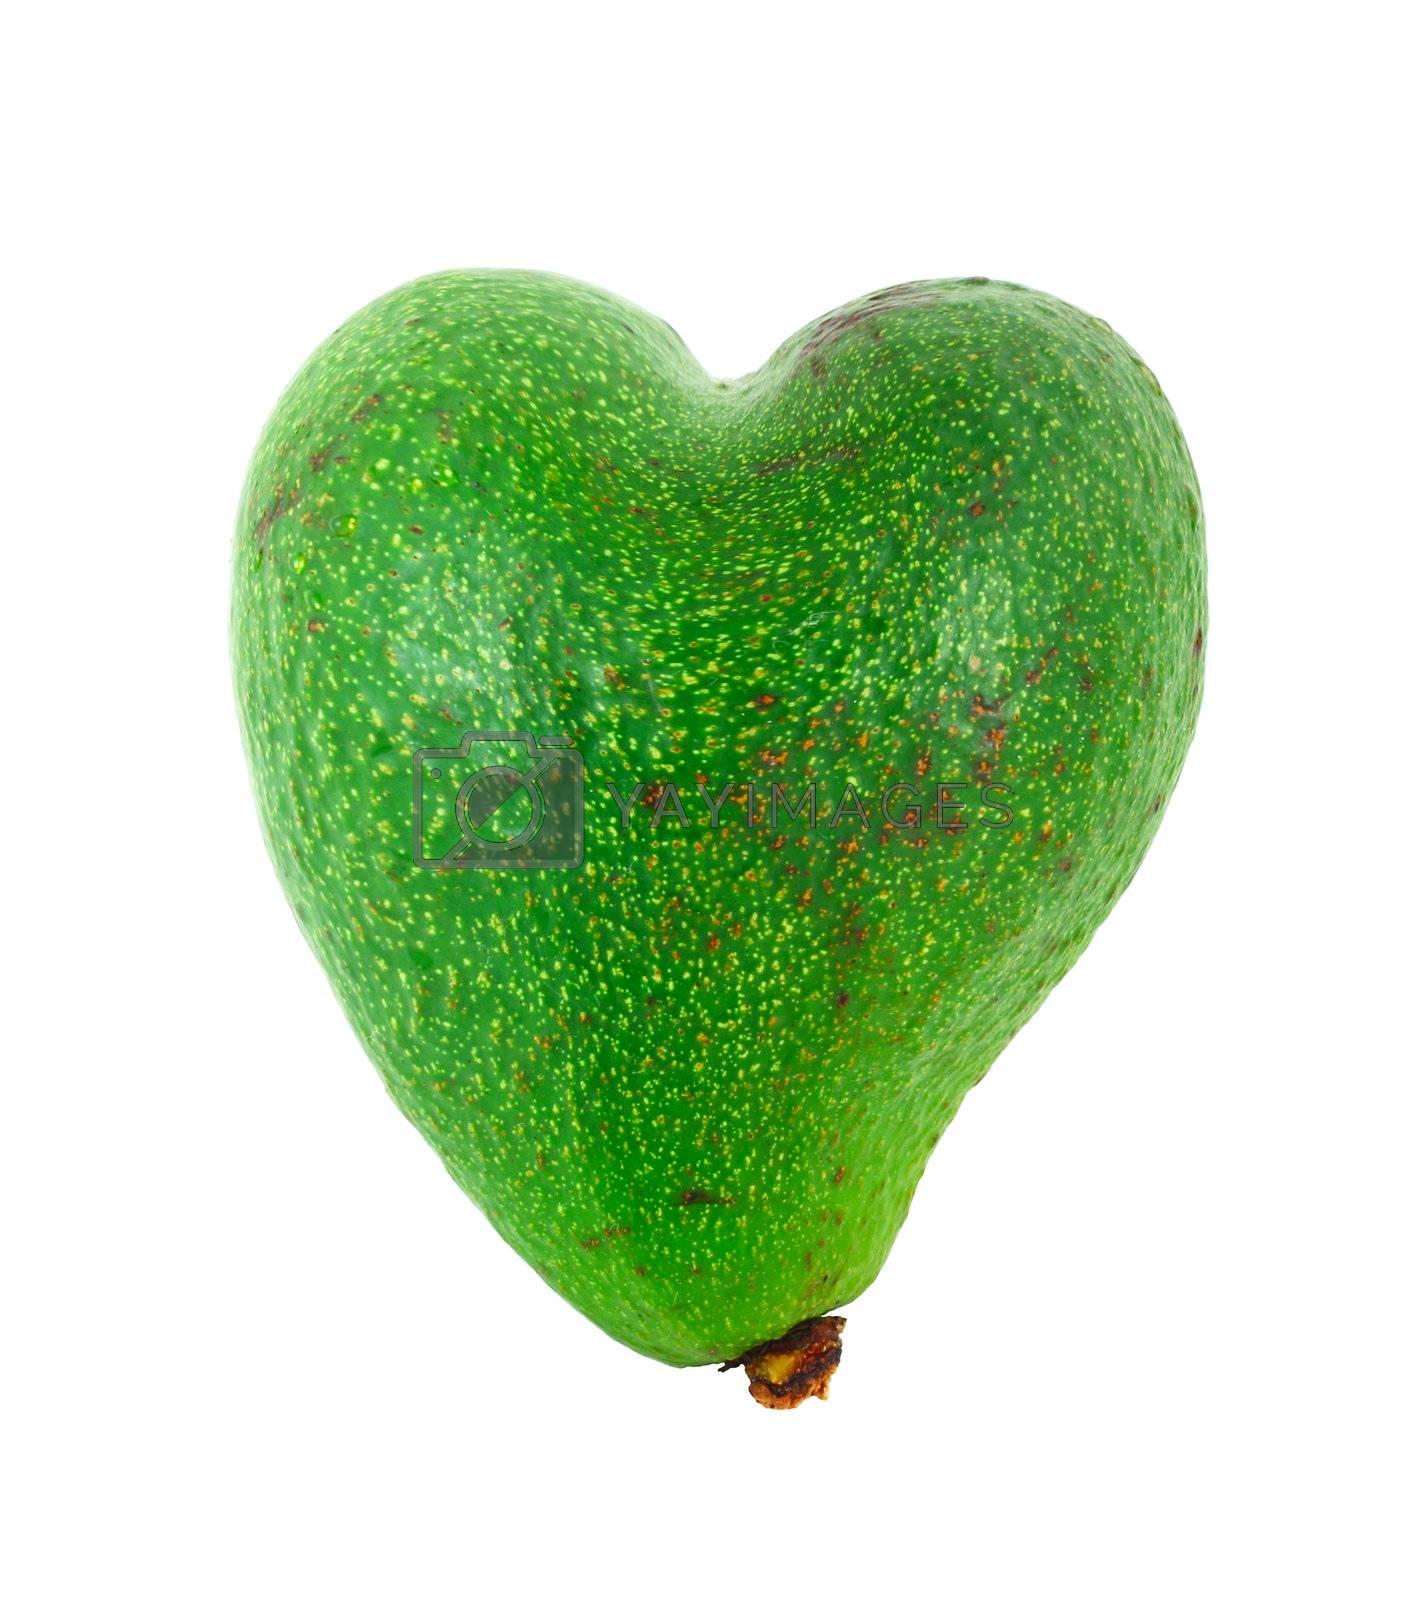 Avocado shaped like heart healthcare concept